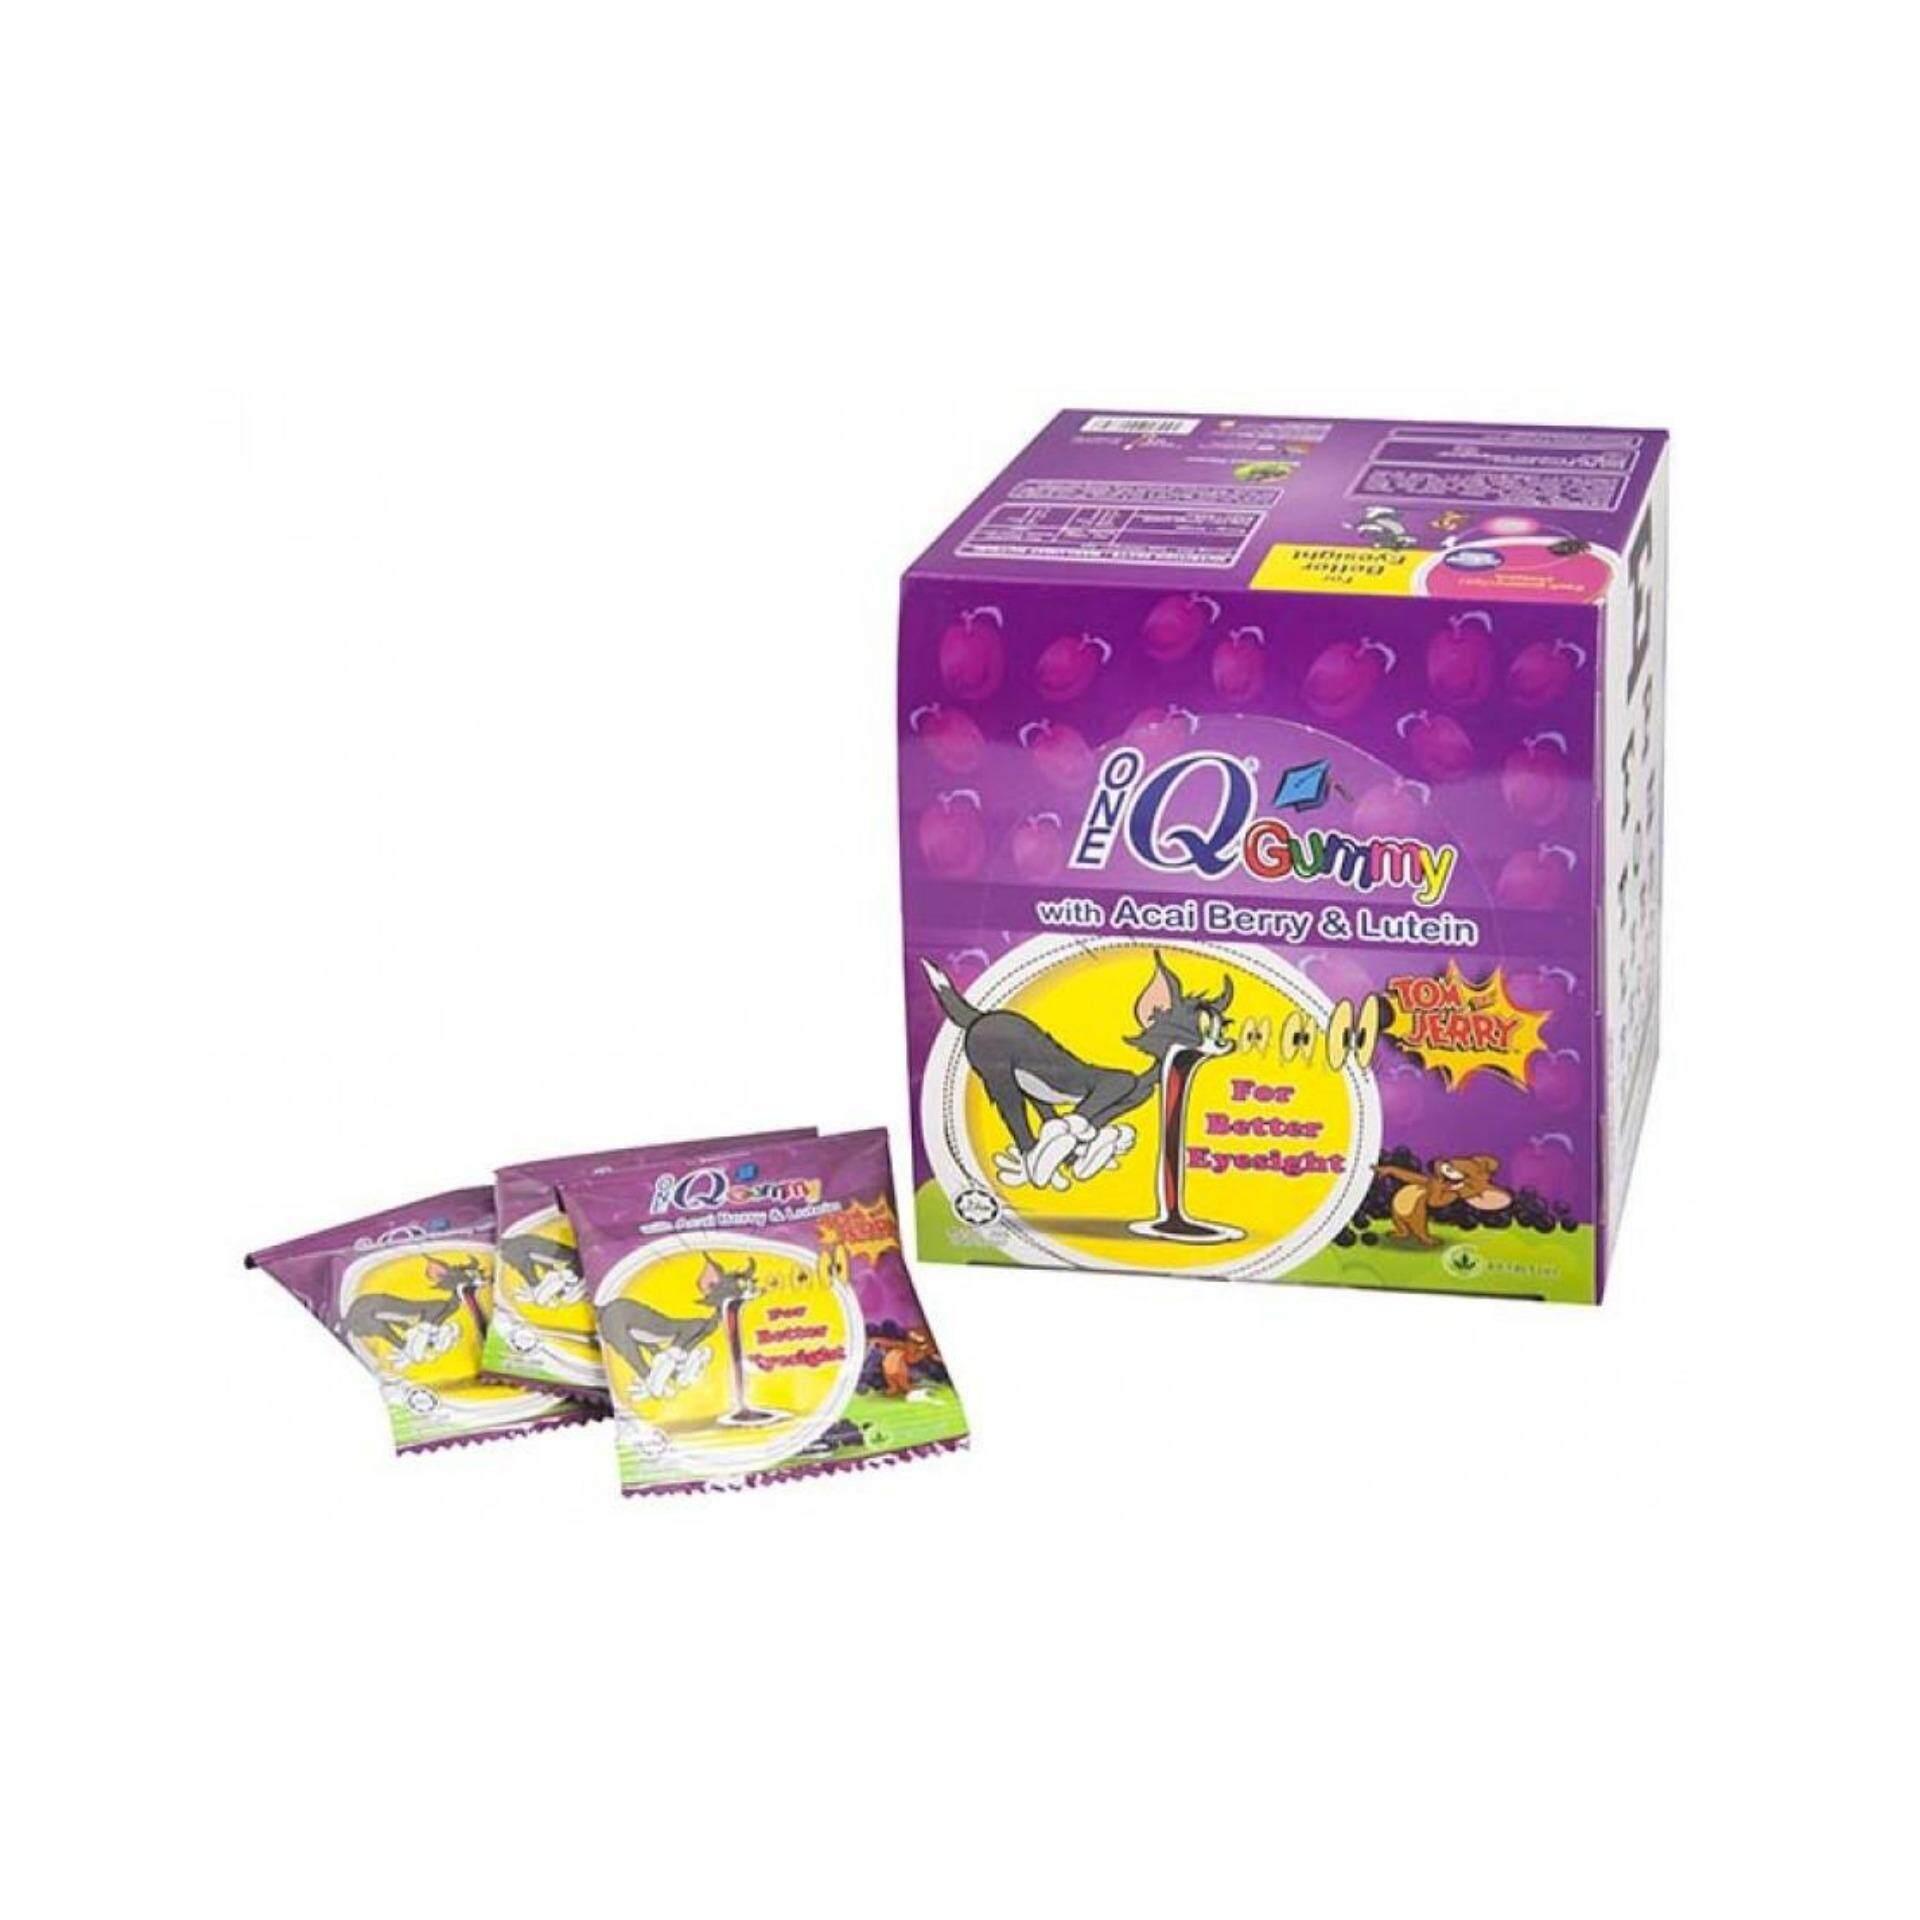 OneQ Gummy Acai Berry & Lutein Kids Eye Vitamin 24packs